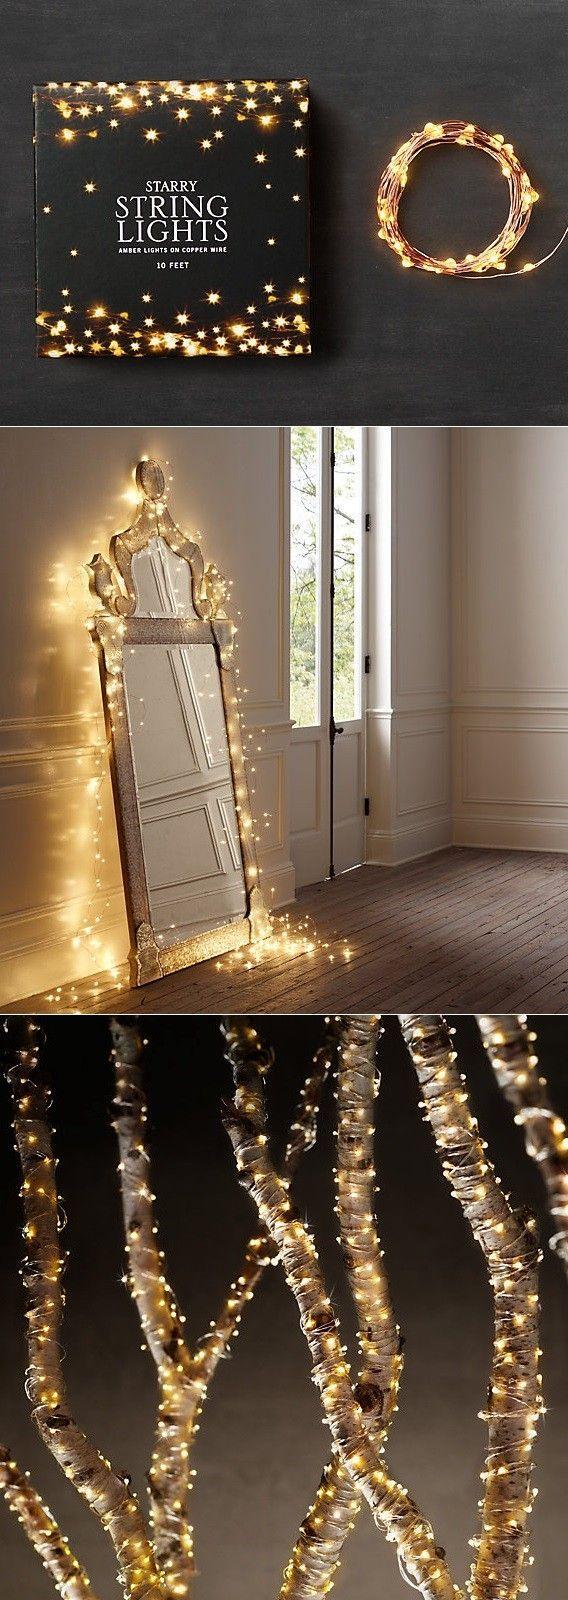 Indoor string lights wedding - Best 25 Wedding String Lights Ideas On Pinterest Reception Backdrop Alternative Wedding Venue And Wedding Background